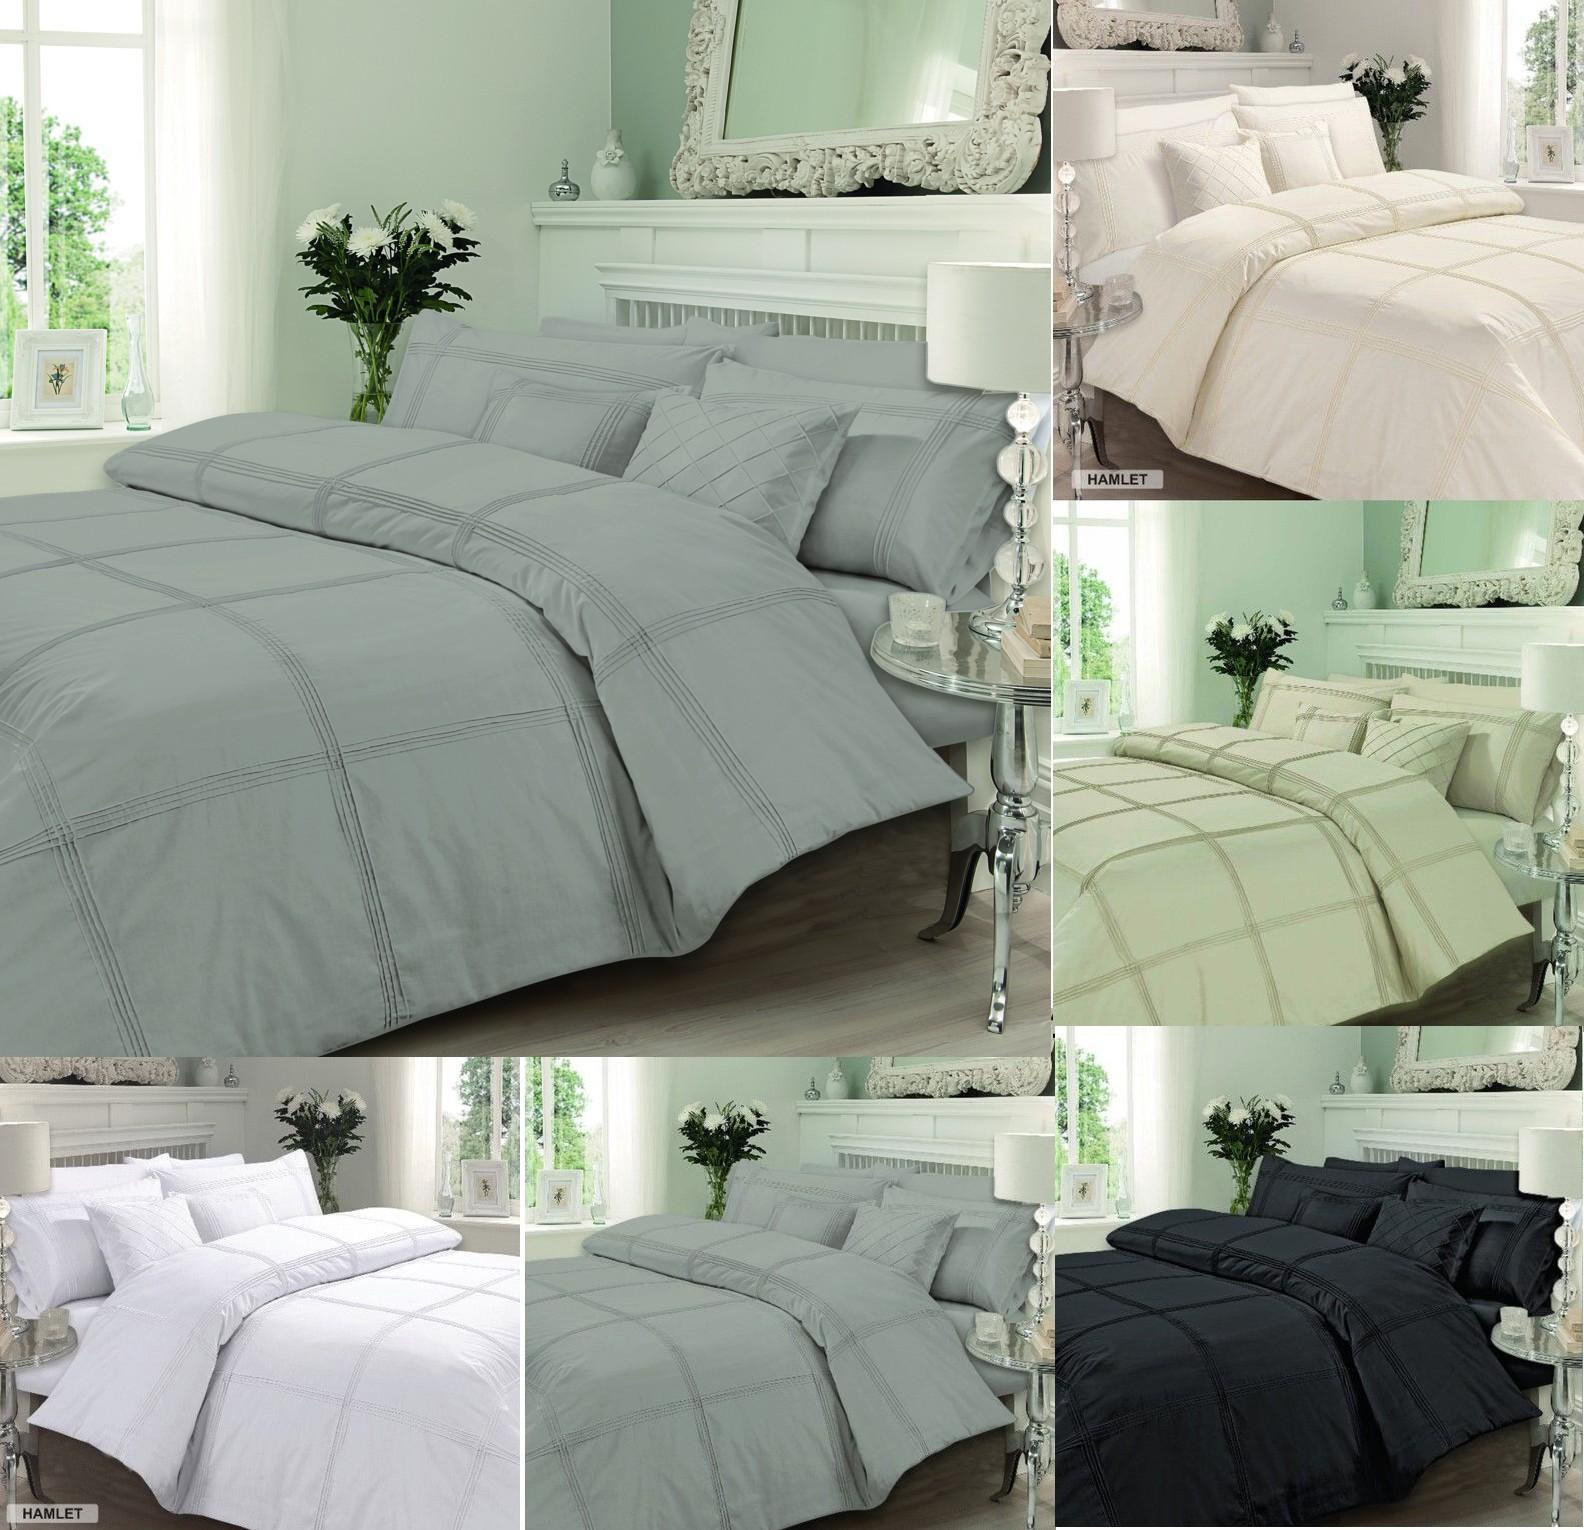 hamlet signature luxury duvet cover bedding set single. Black Bedroom Furniture Sets. Home Design Ideas